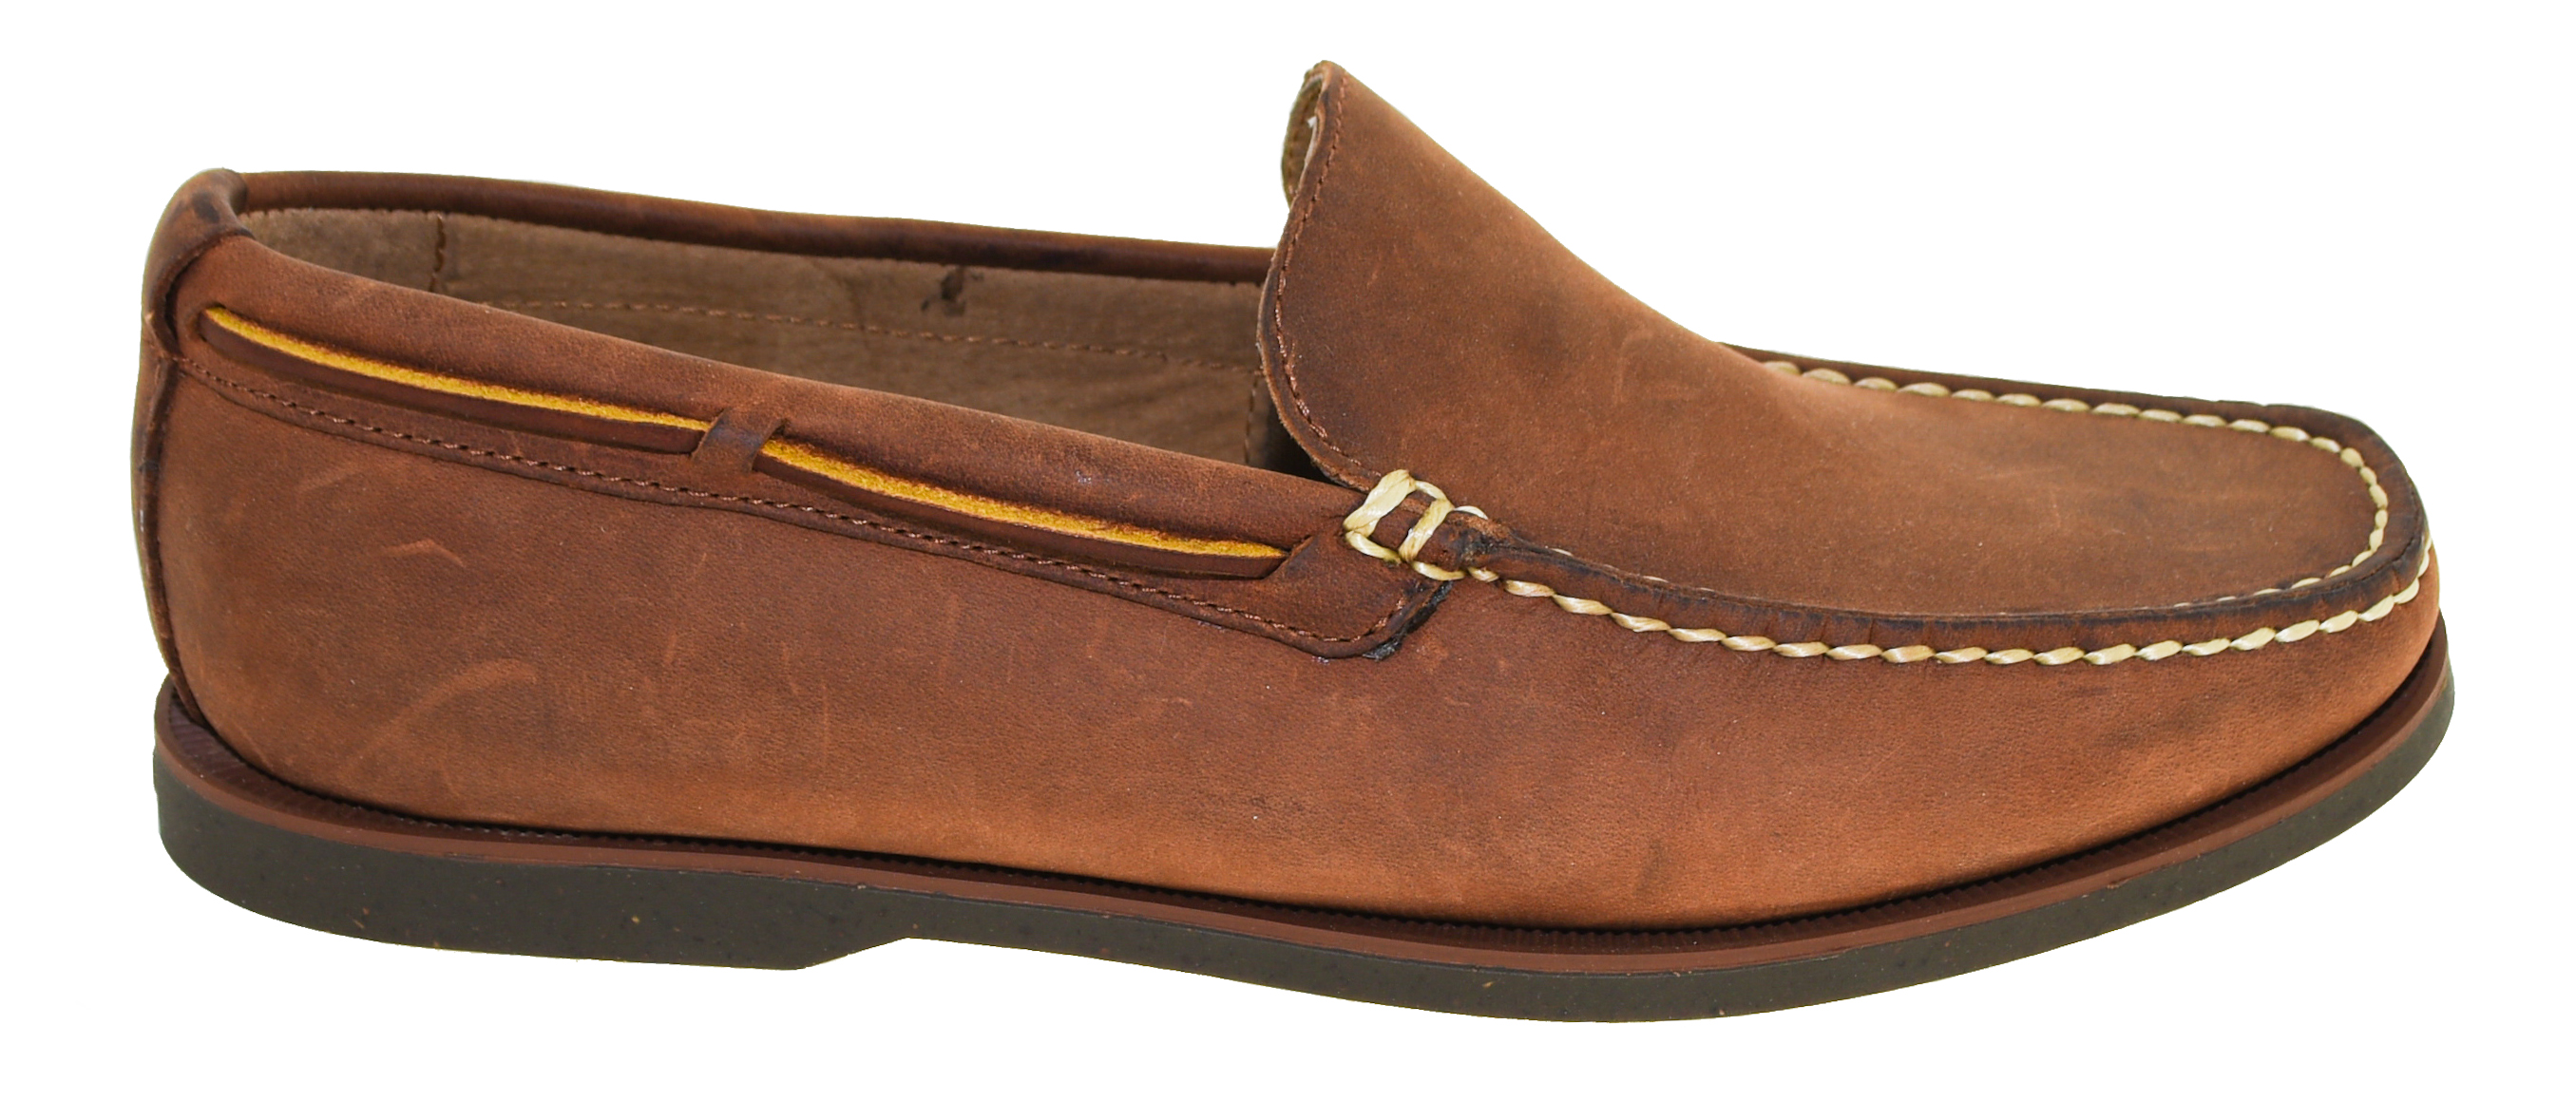 8a3e3fe91ae Polo Ralph Lauren Men s Blackley Slip On Loafer Scotch Brown